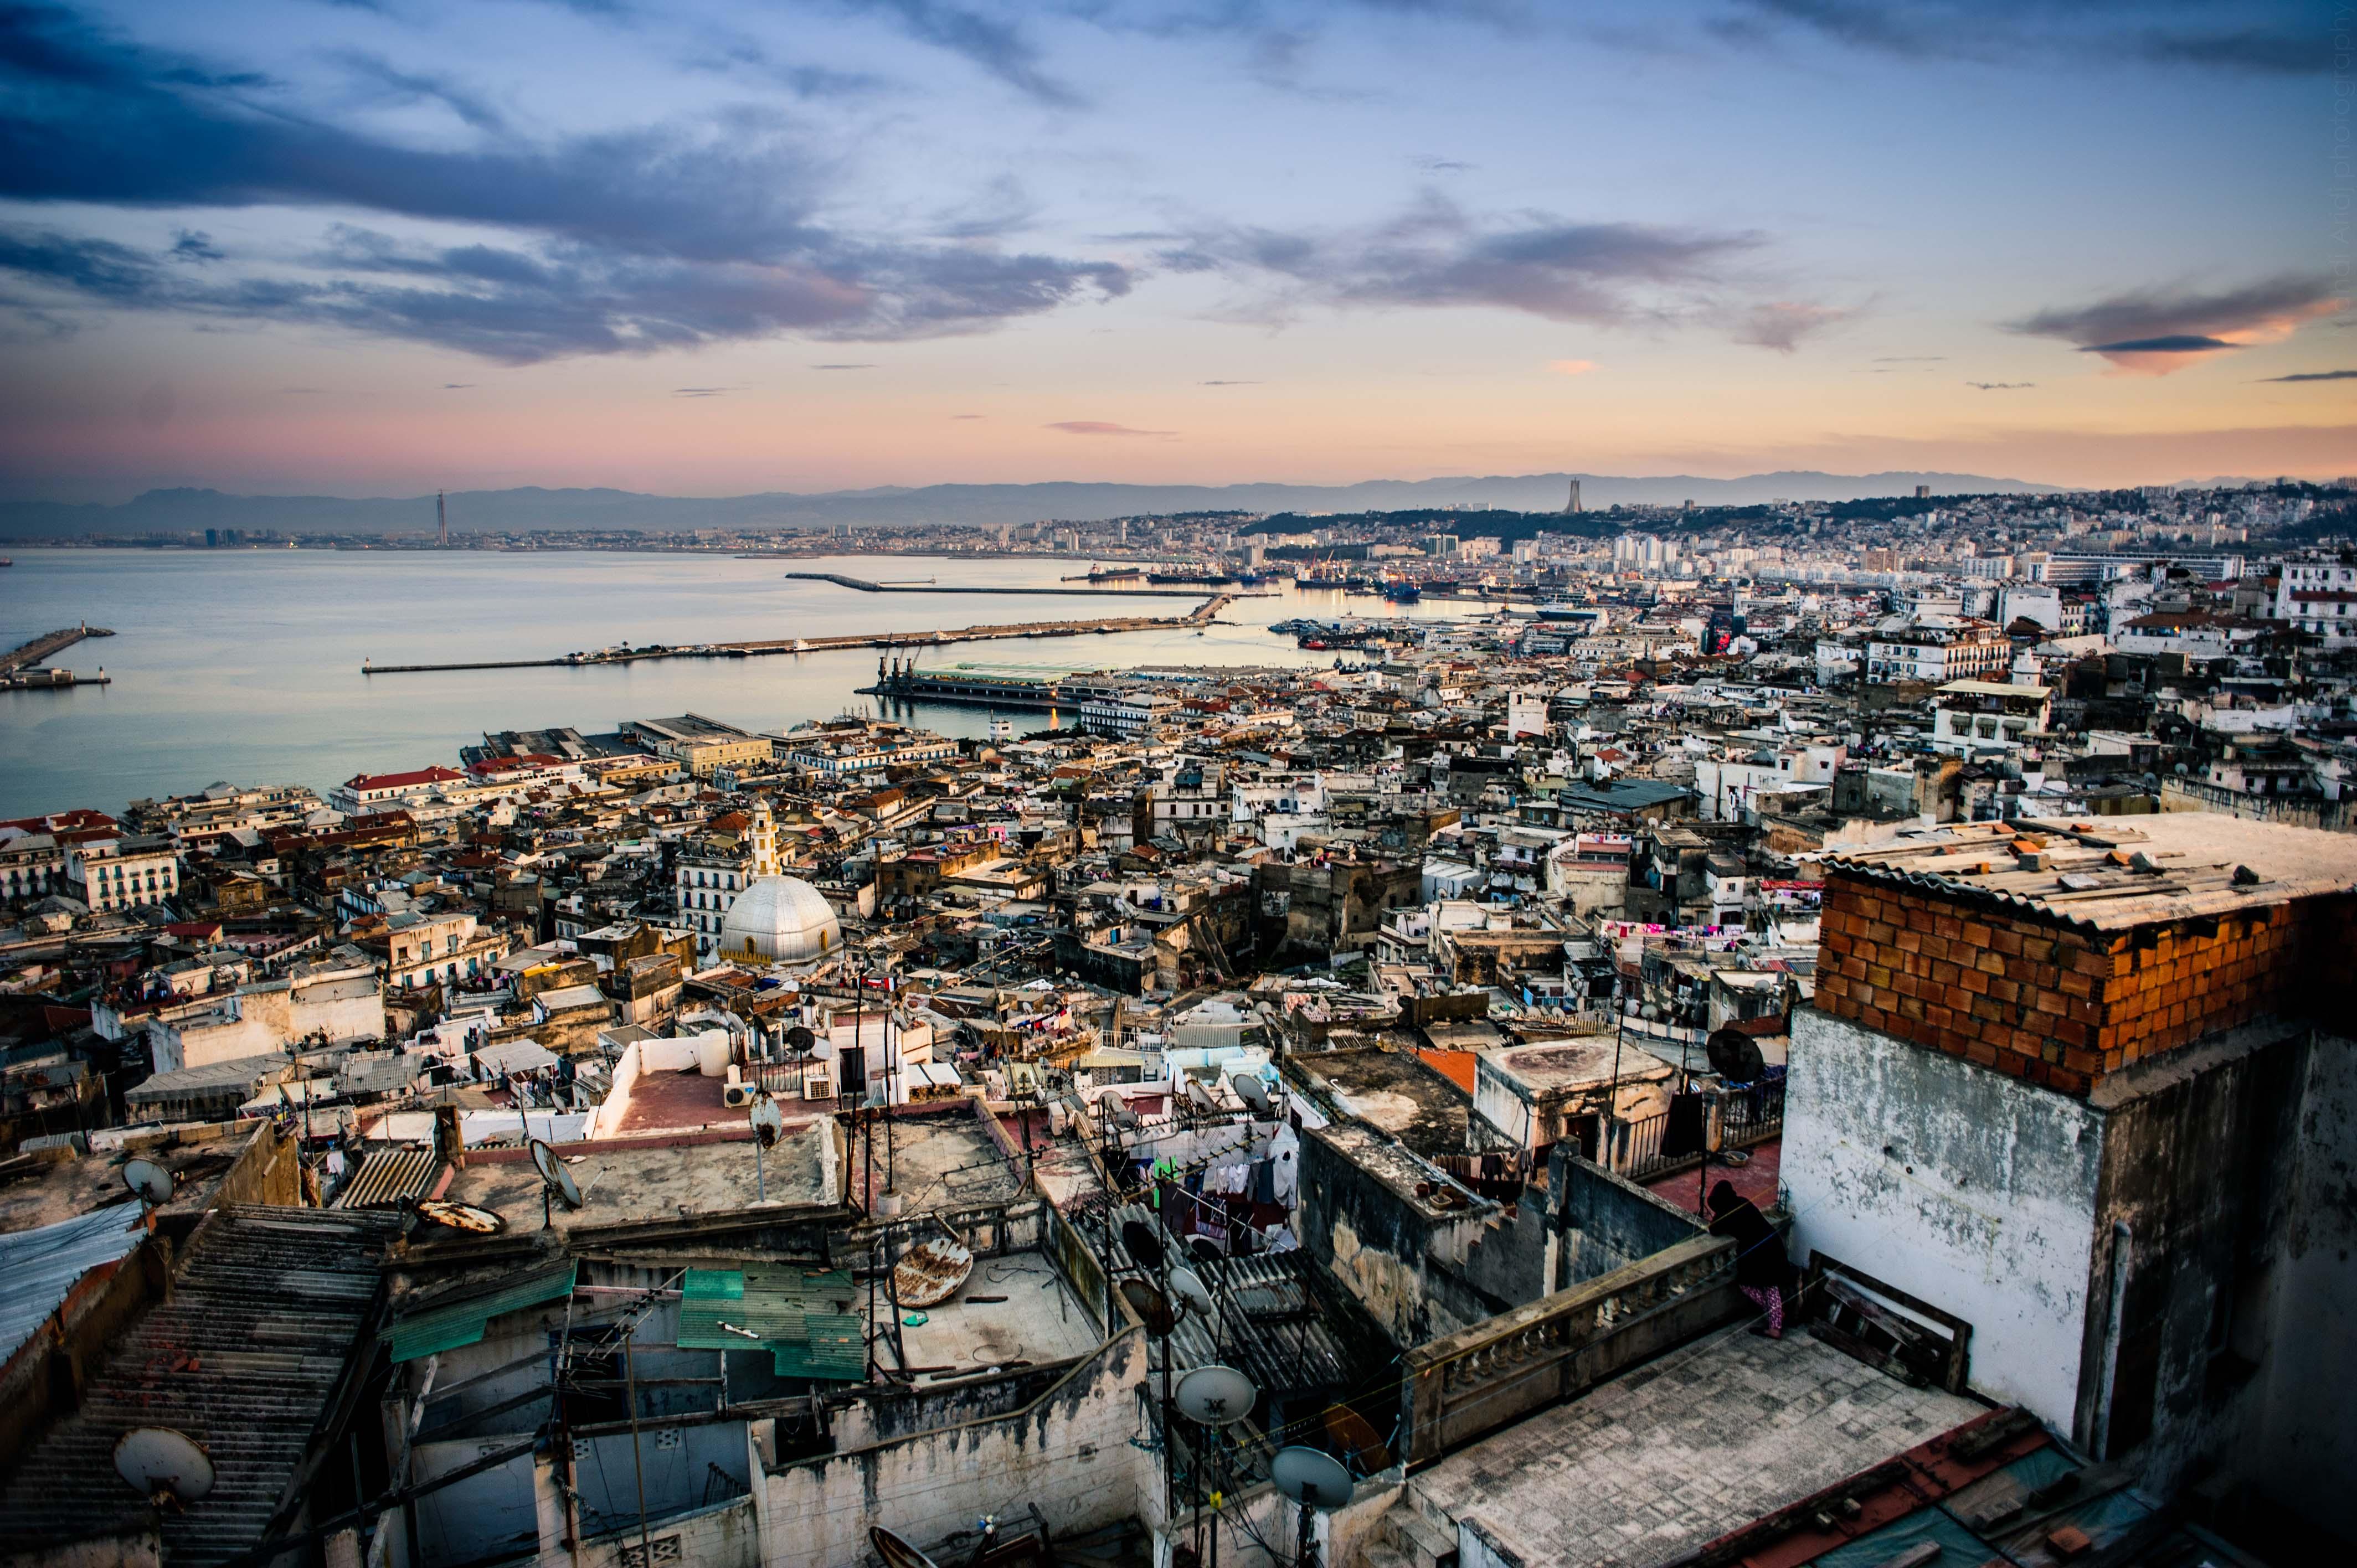 La Casbah d'Alger en photos 33